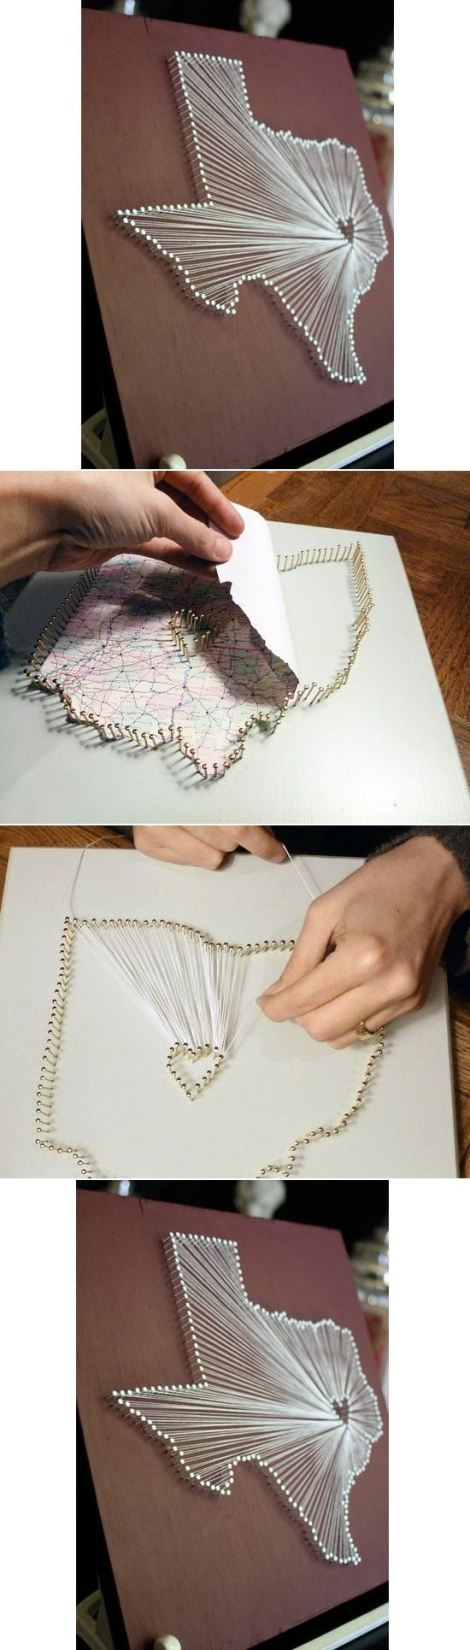 картины из ниток на гвоздях